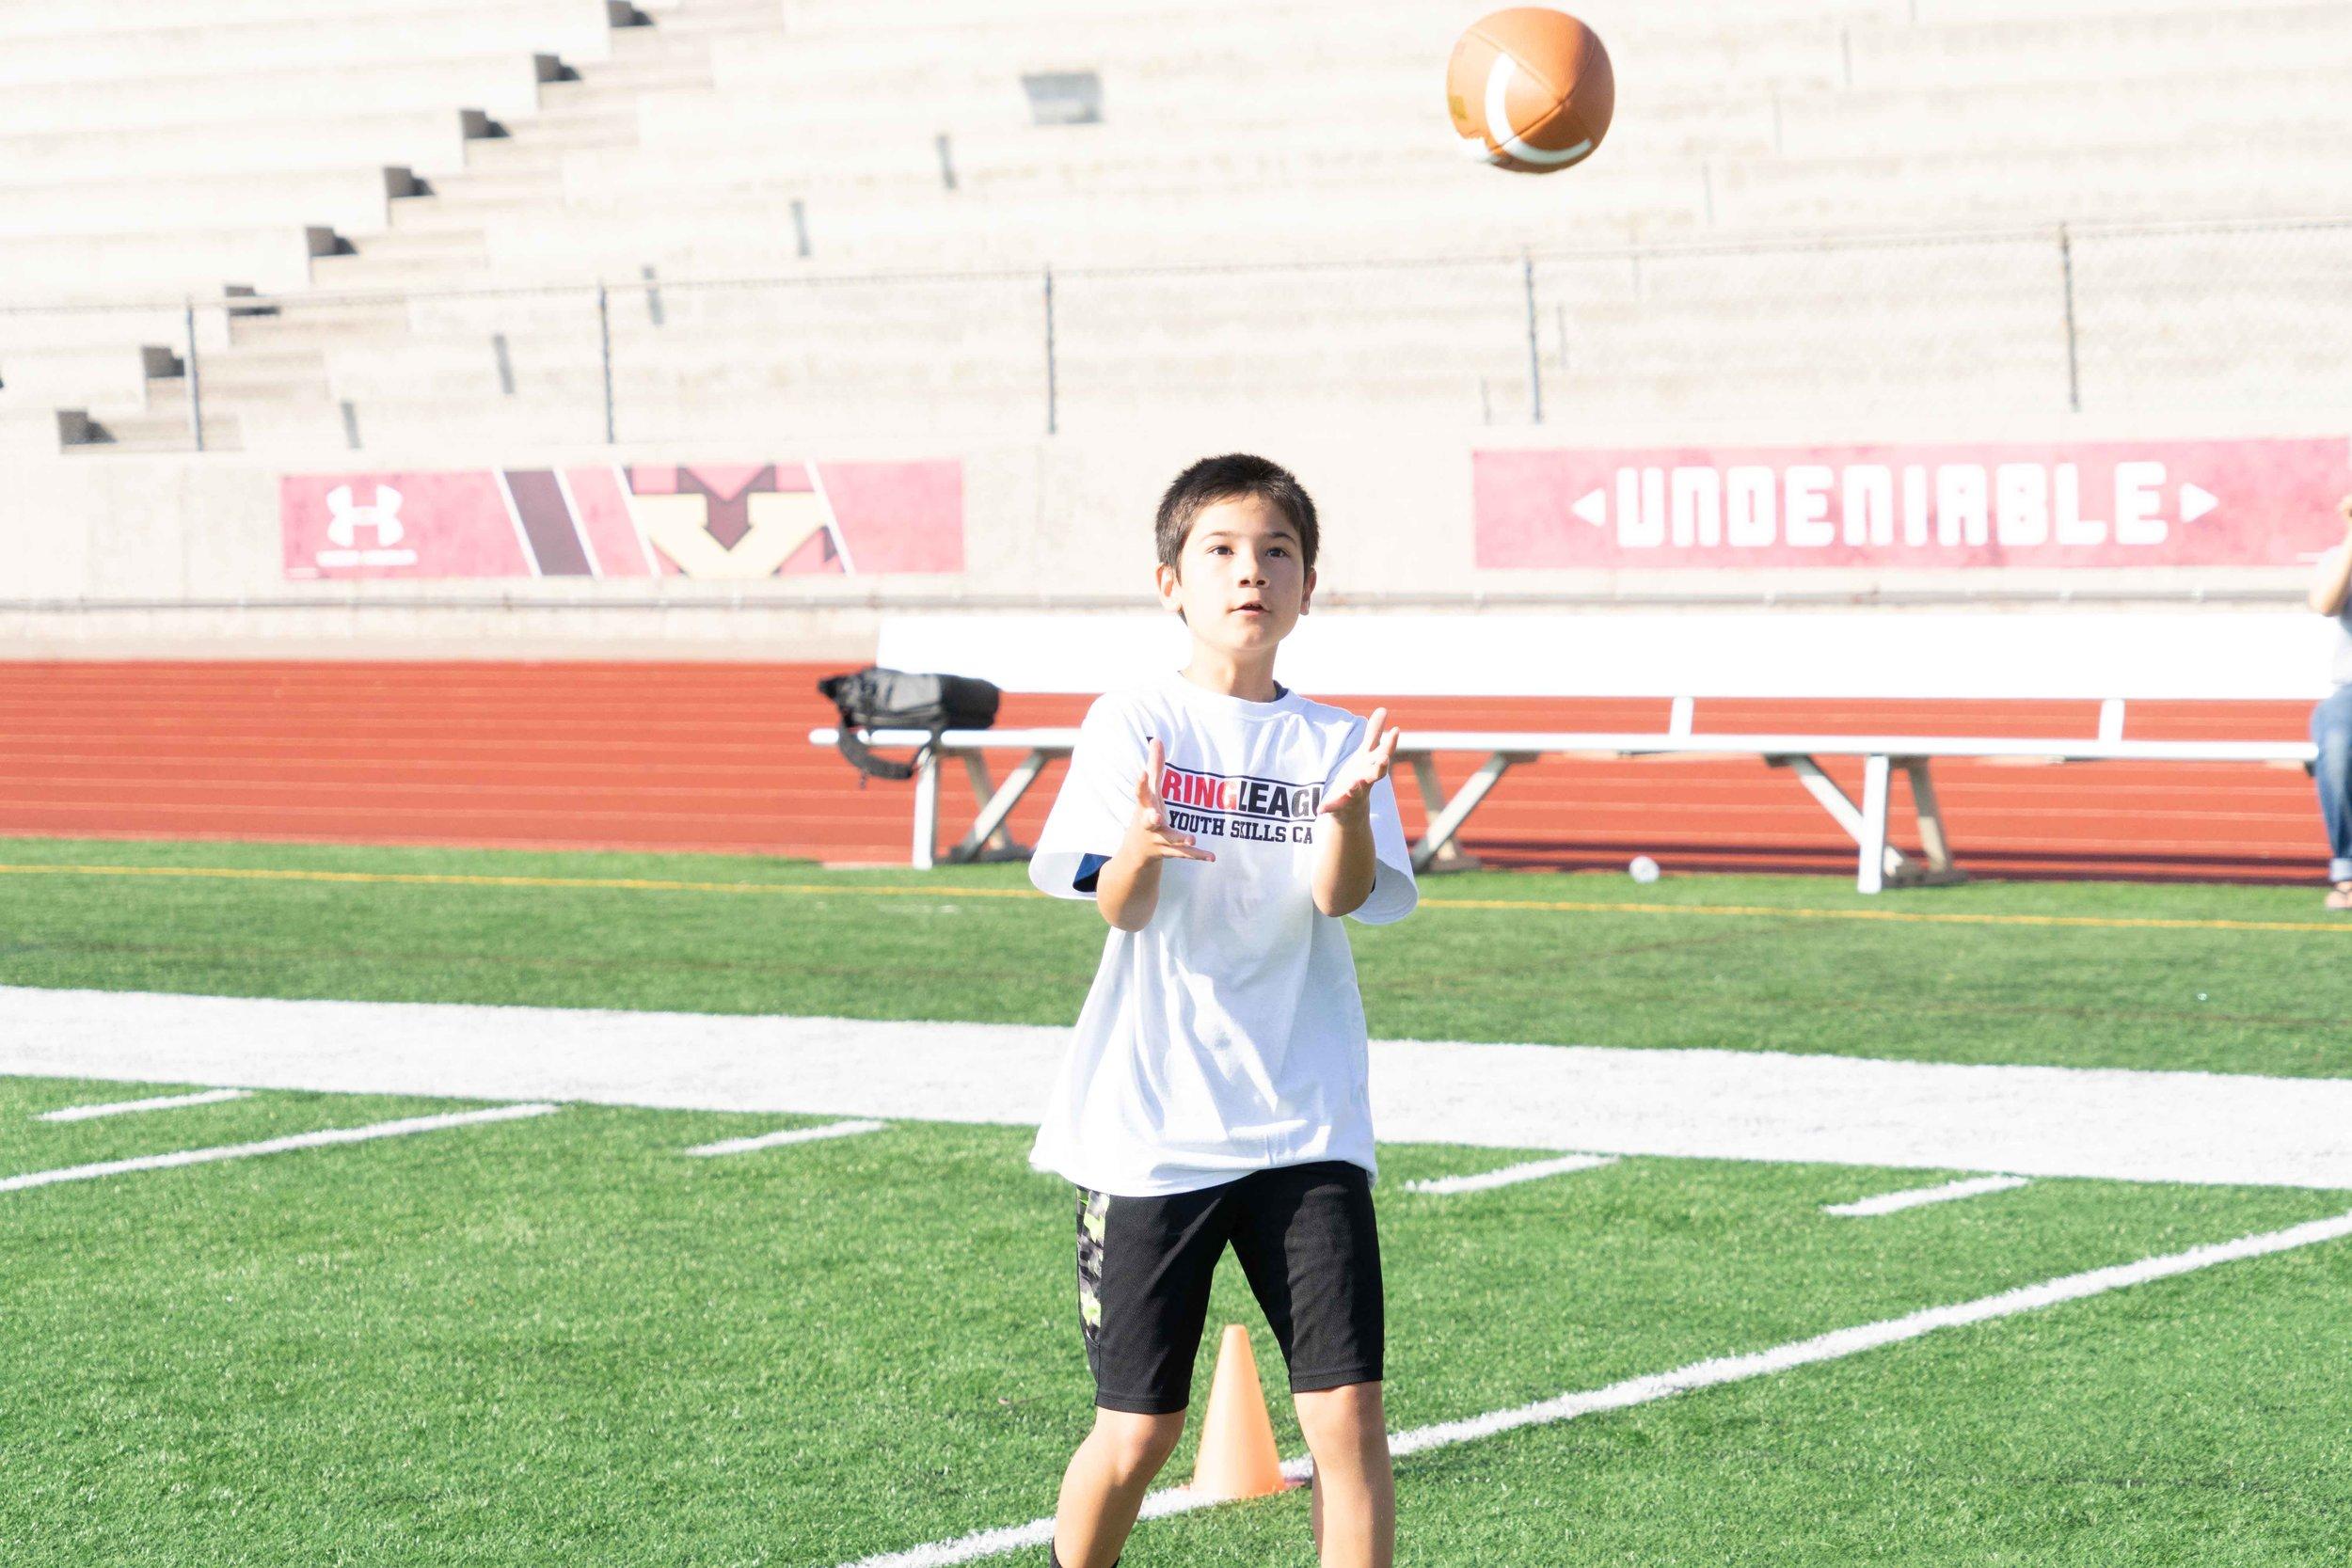 The Spring League Kids Skills Camp-29.jpg